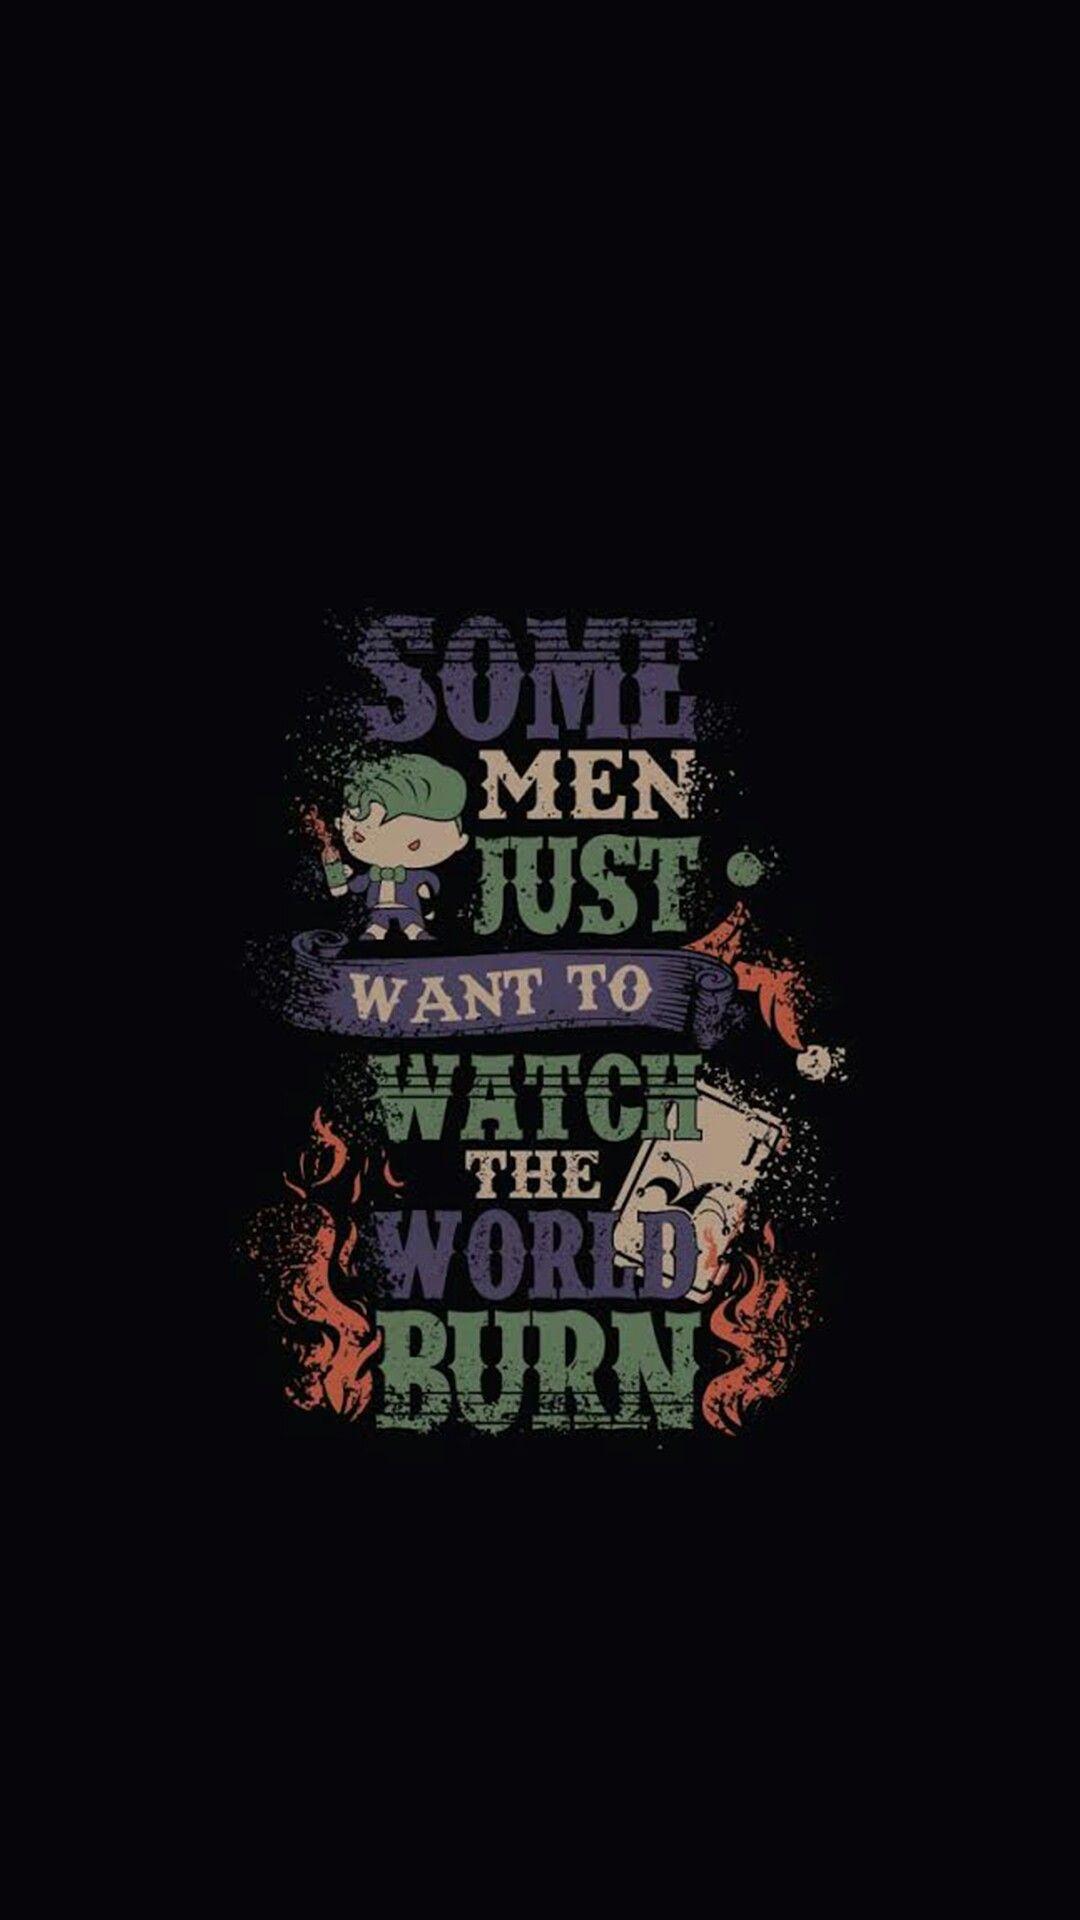 Someman Cartoon Wallpaper Iphone Wallpaper Quotes Words Wallpaper